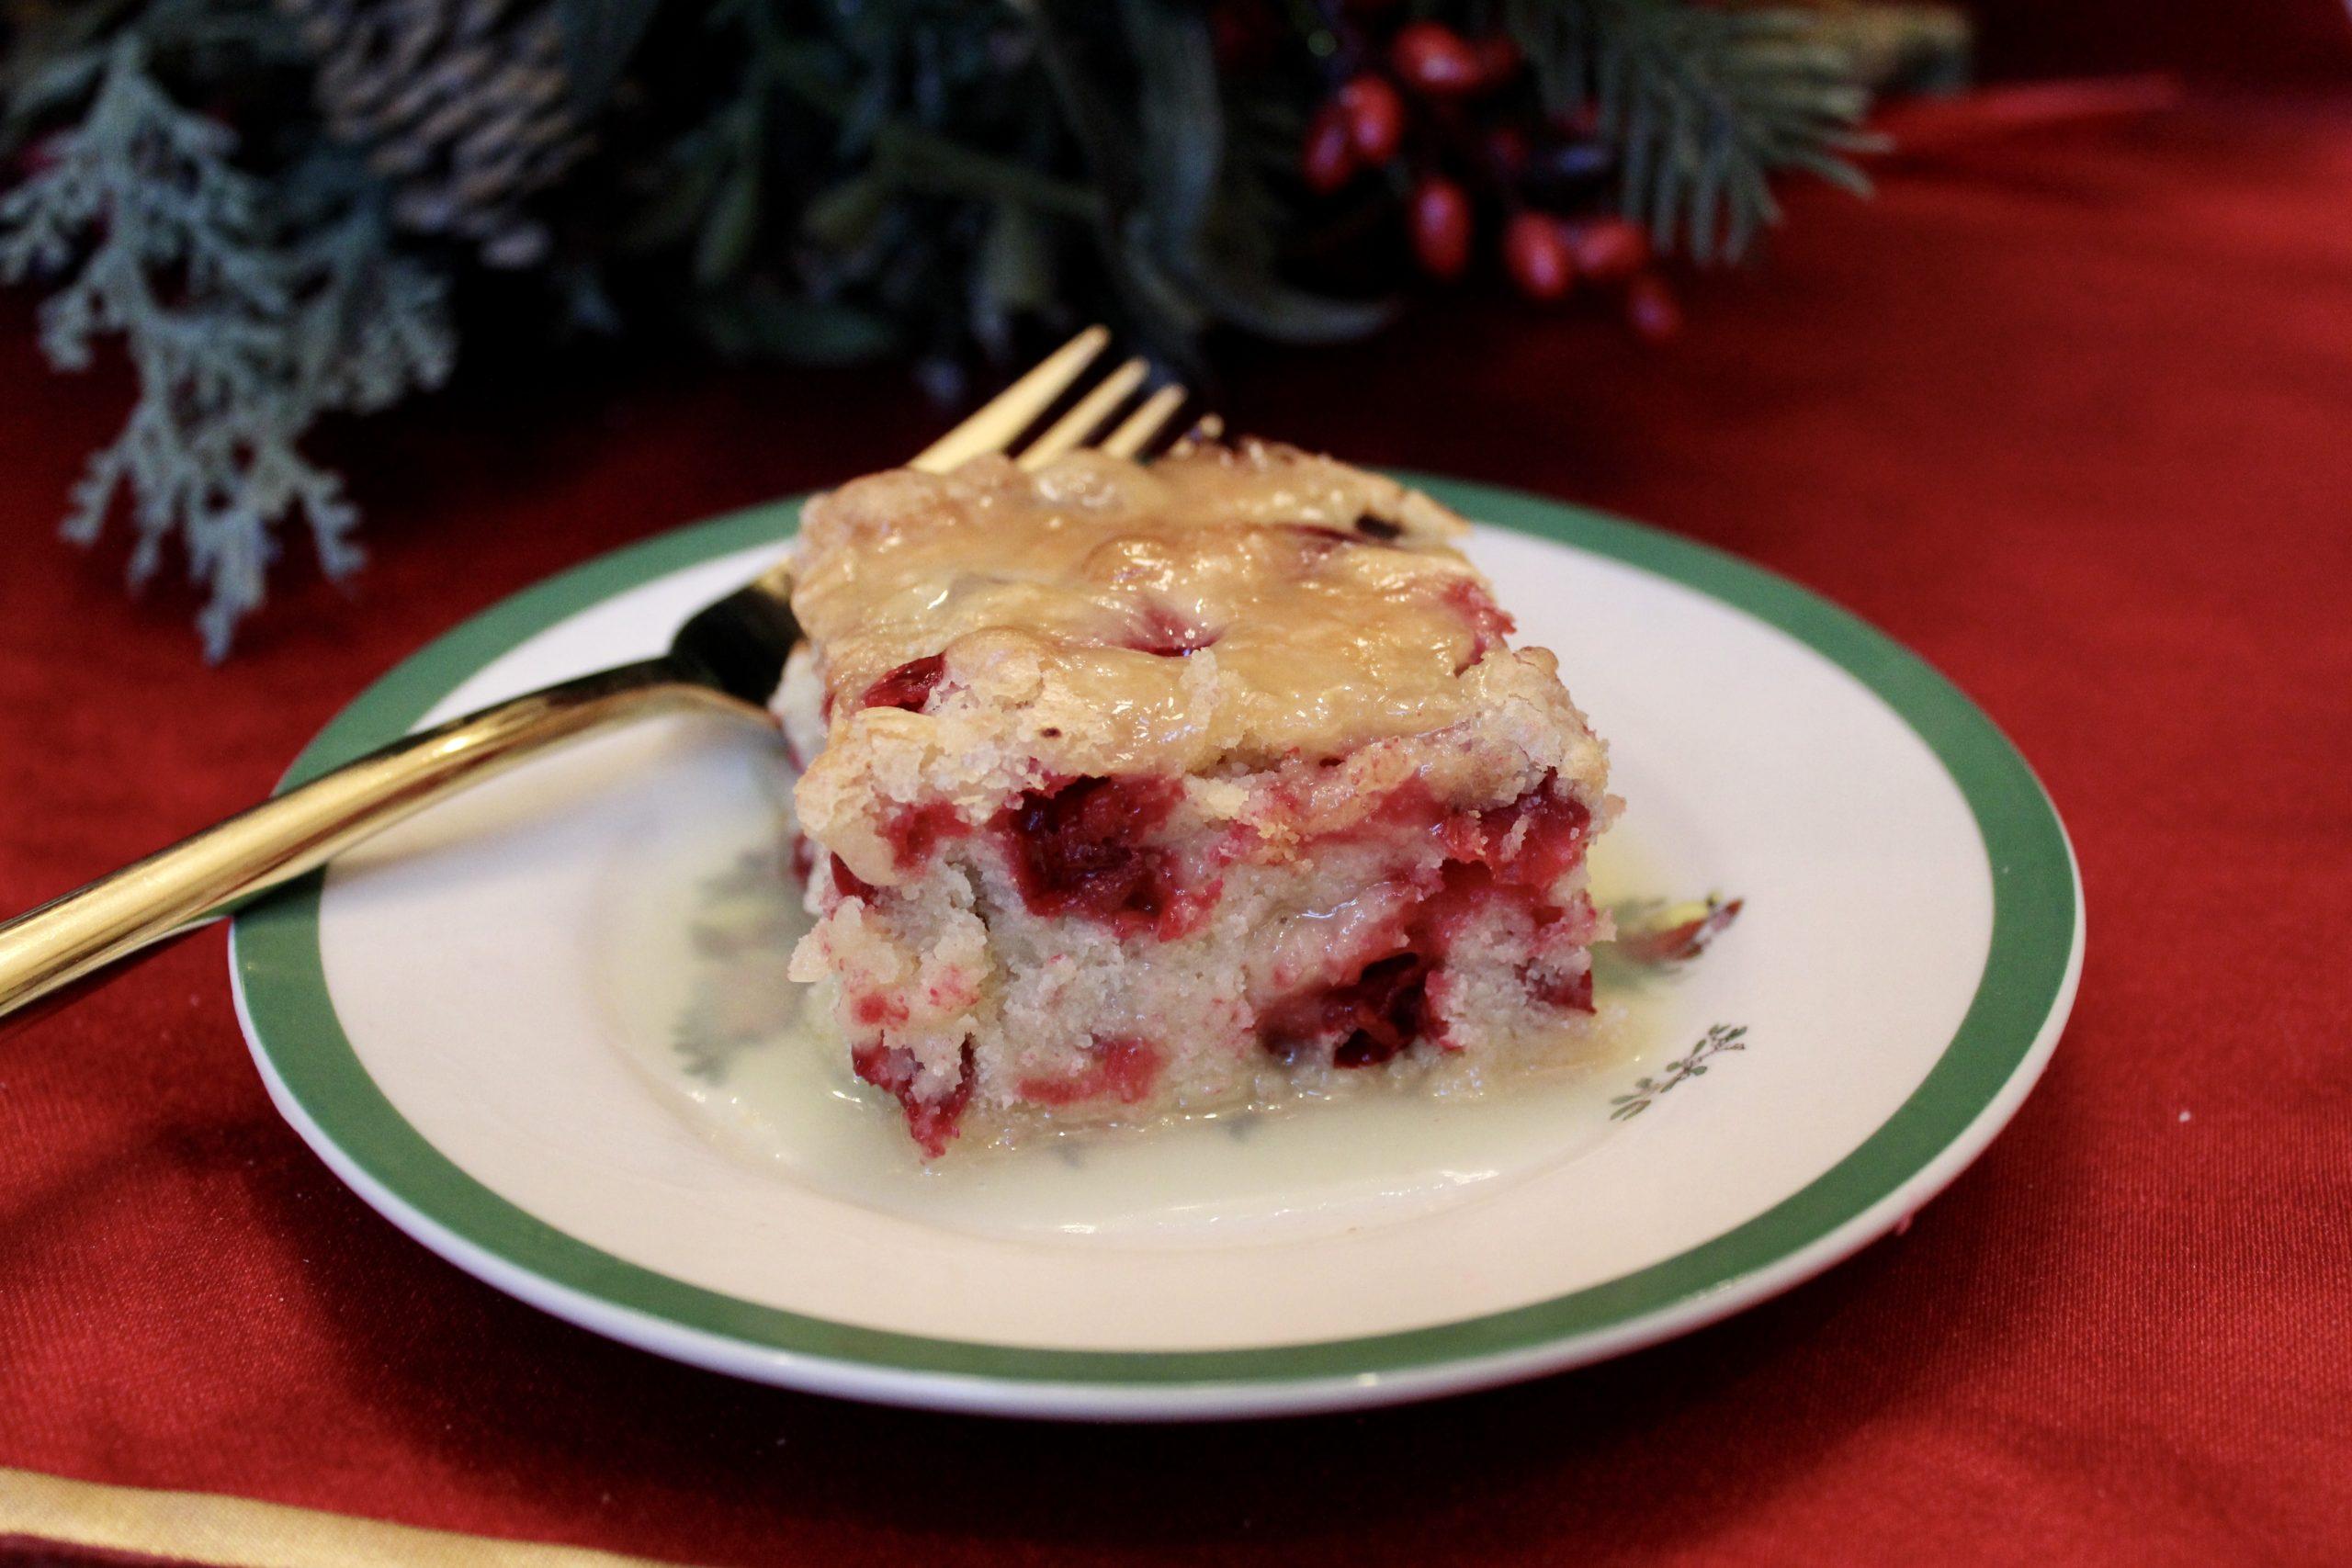 Cranberry Cake with Cream Sauce